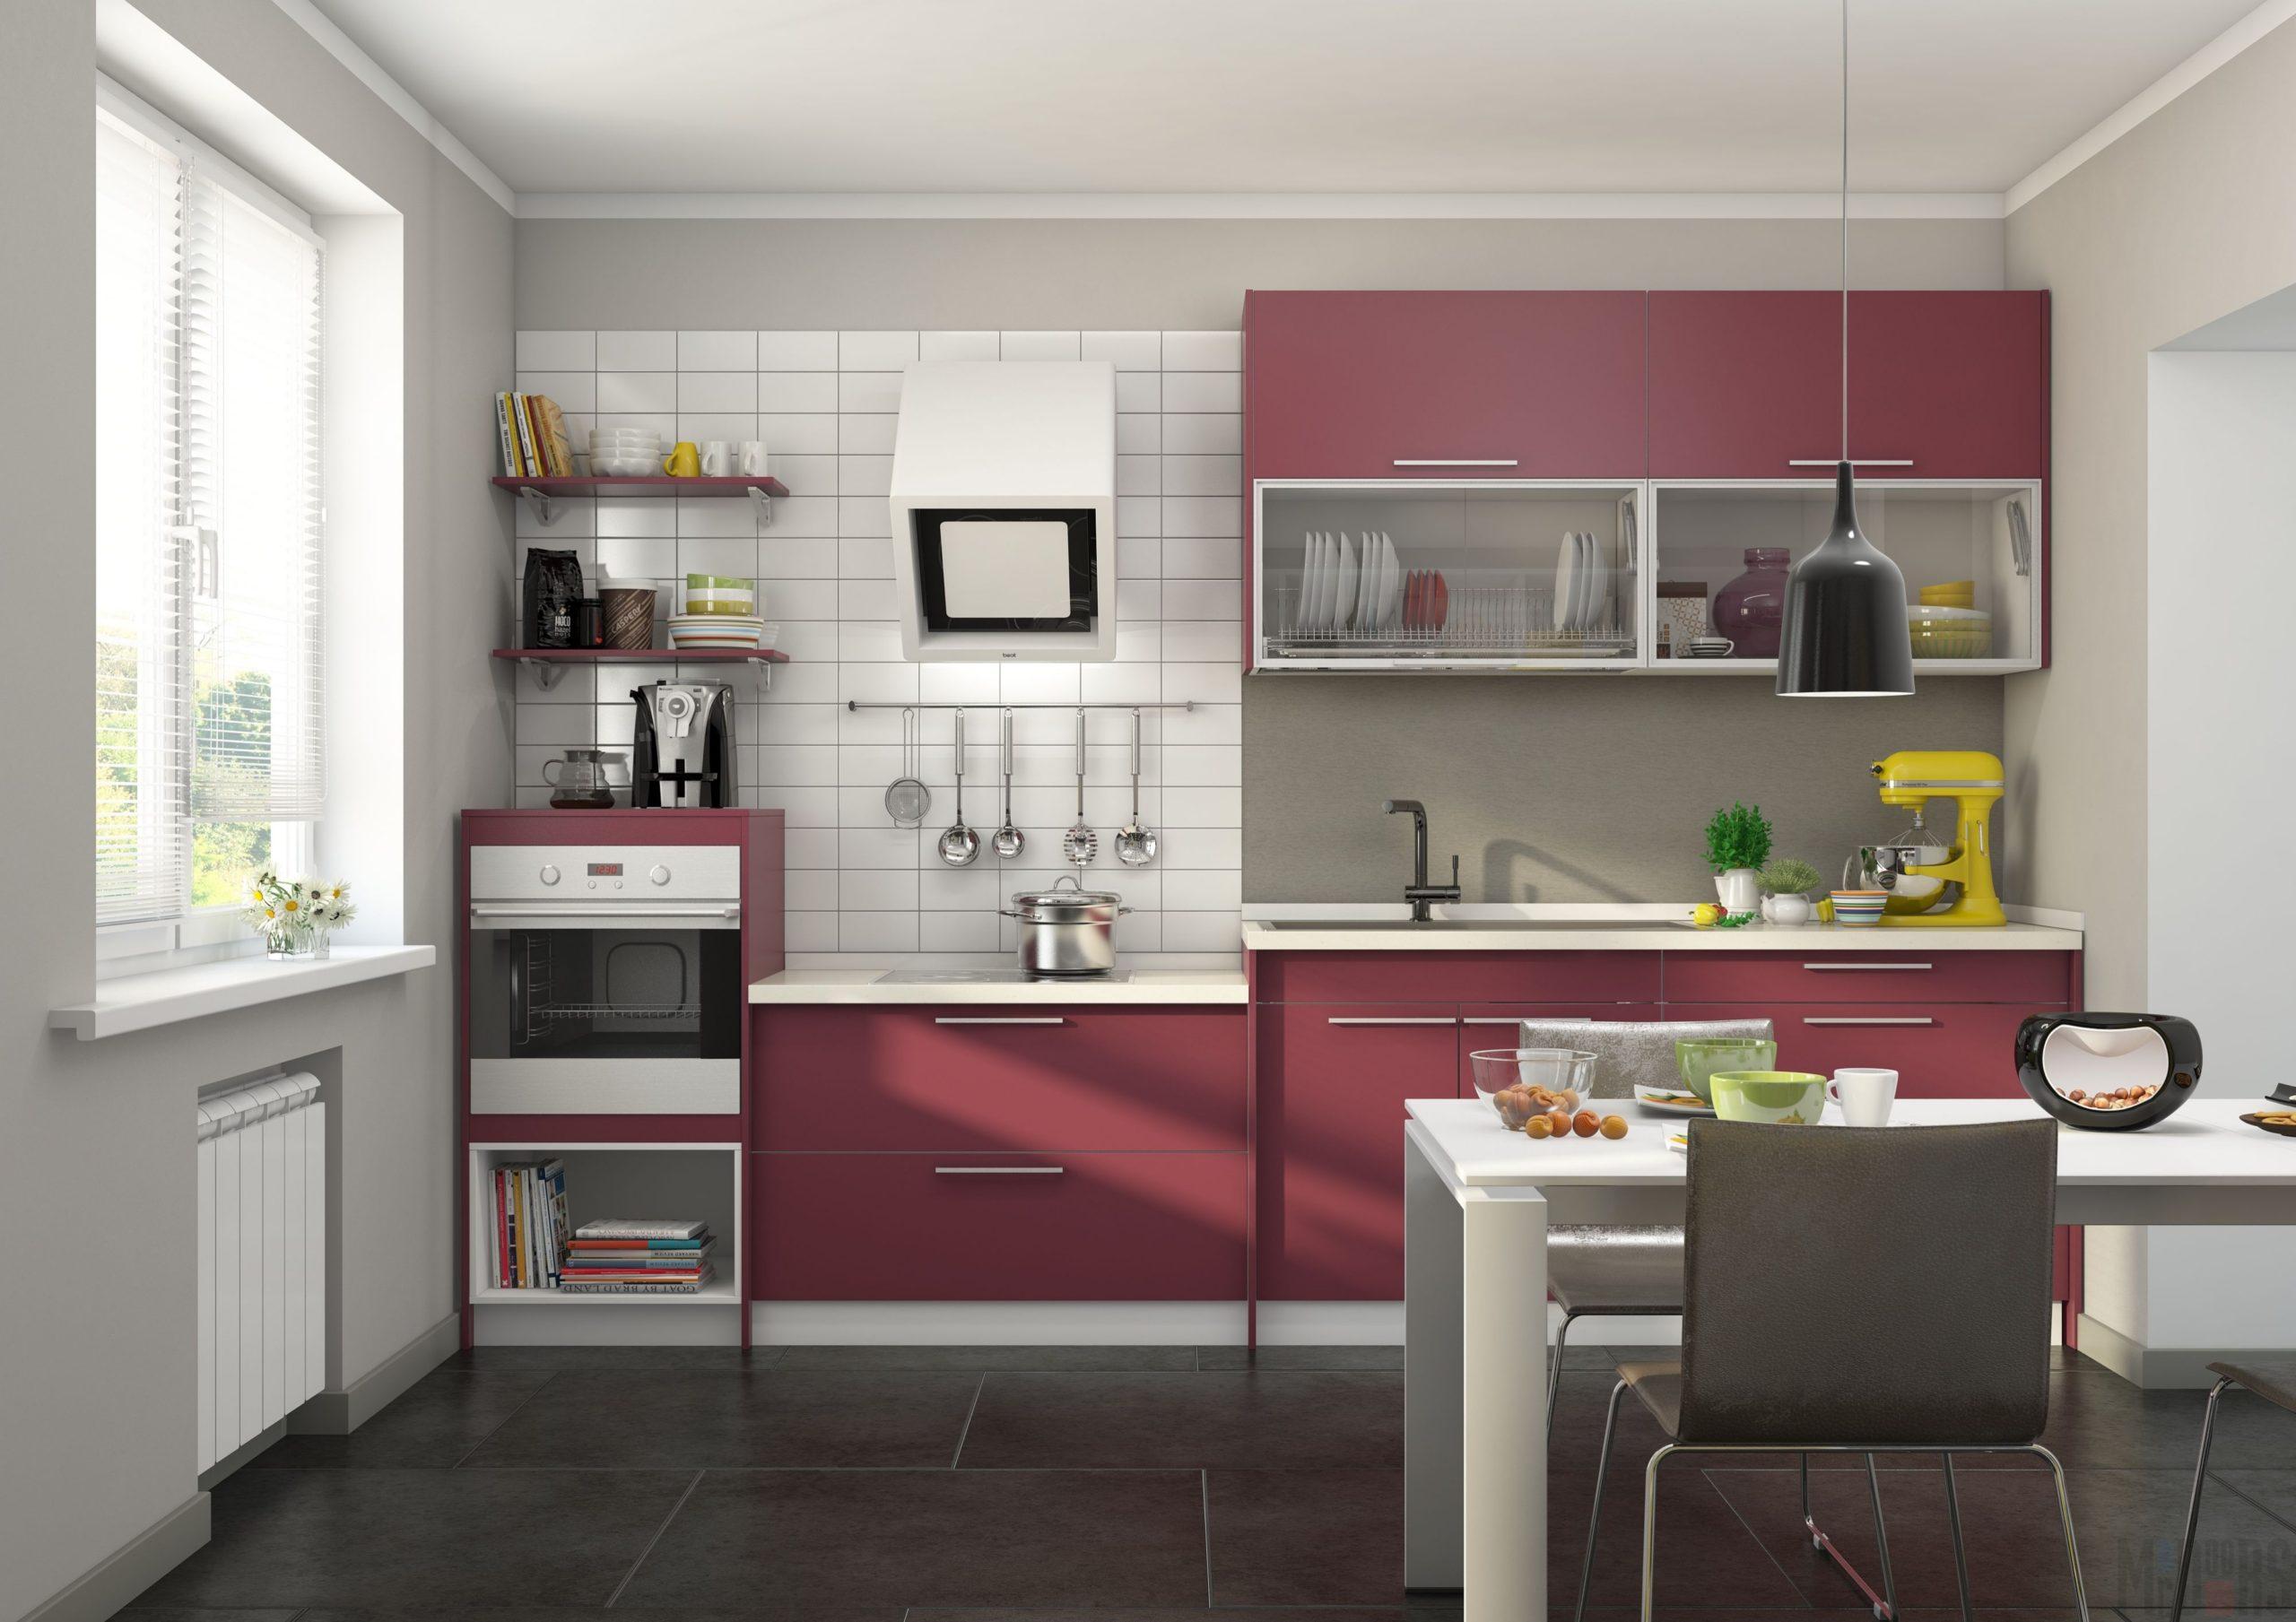 Кухня Interium Модерн.09 - яркий дизайн